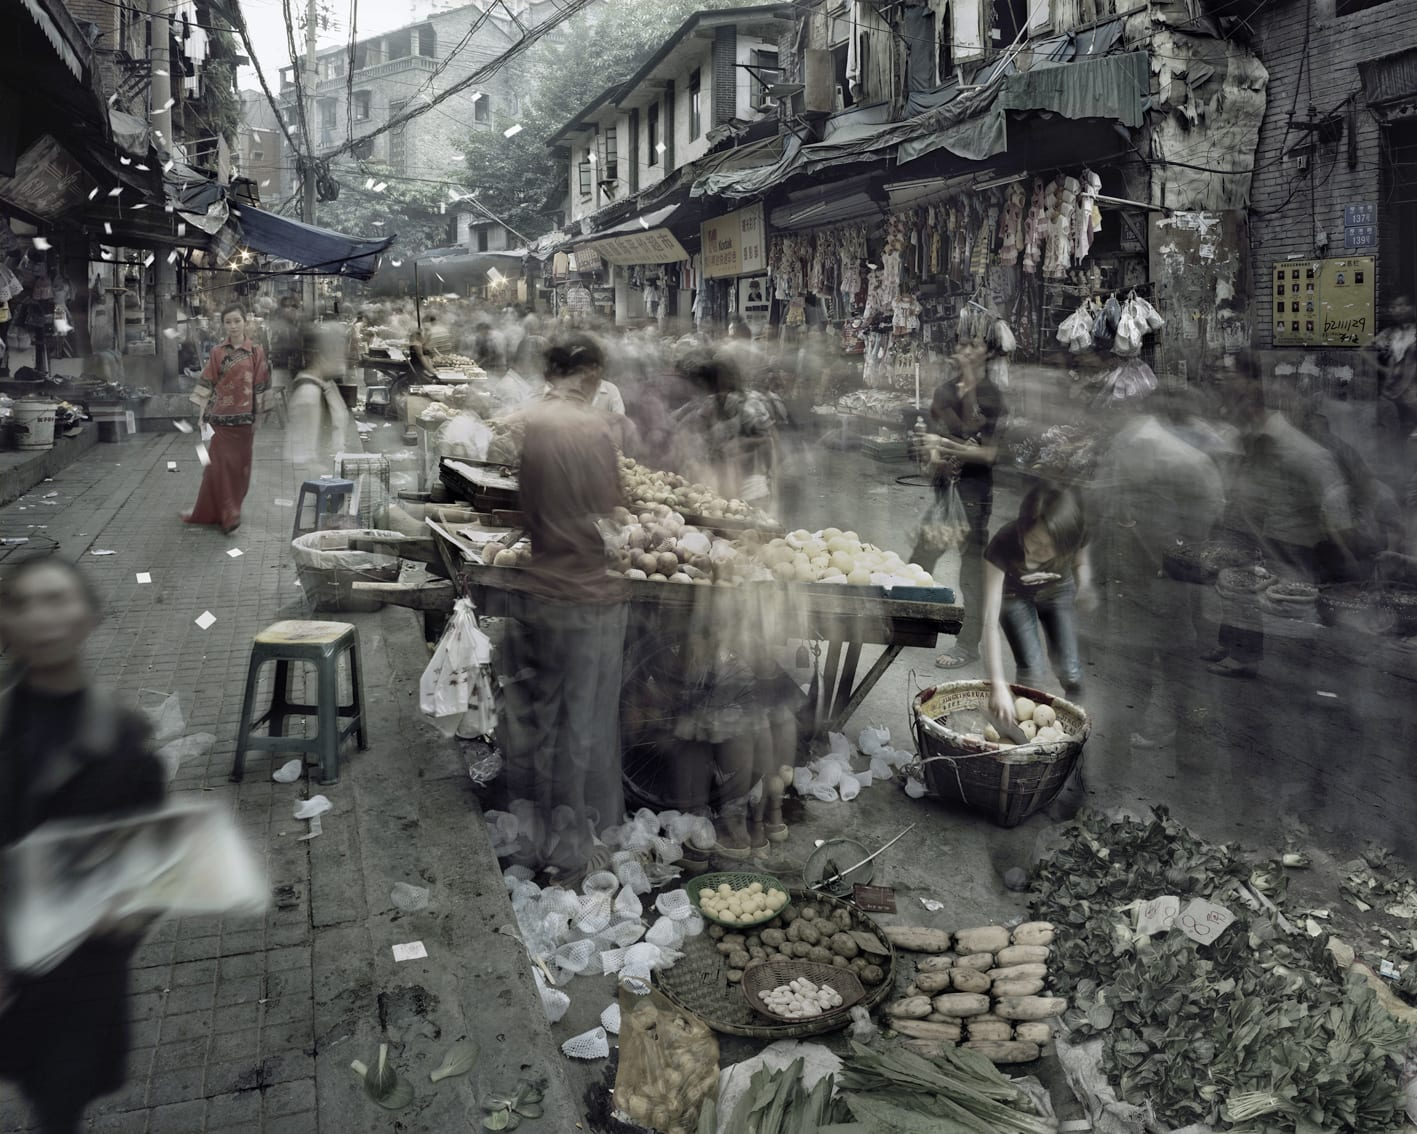 Qin Wen 秦文, Old City - Jiaohuazi Street 故城系列之叫花子街, 2011